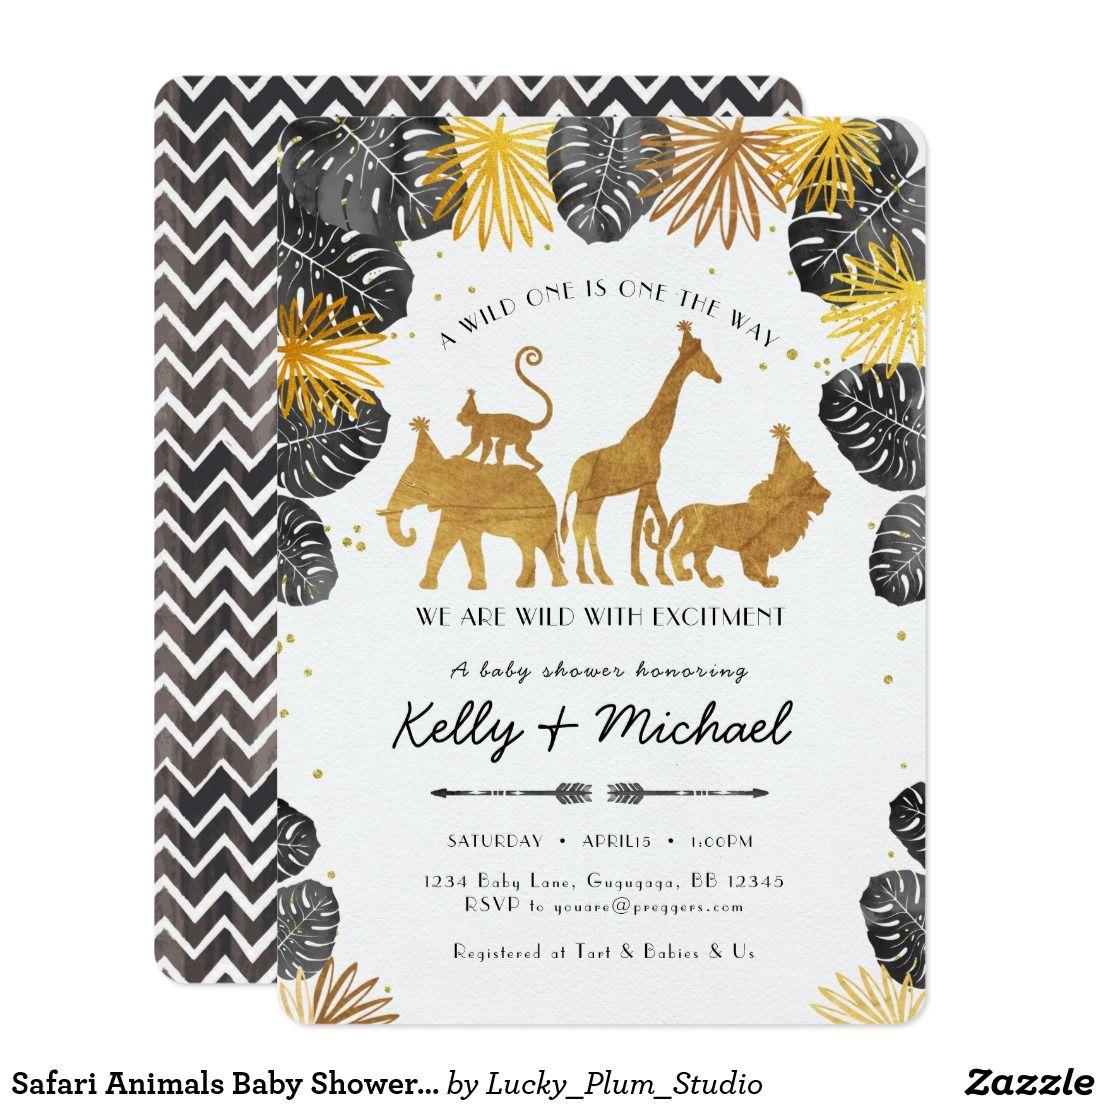 Safari Animals Baby Shower Invitation | Shower invitations, Baby ...